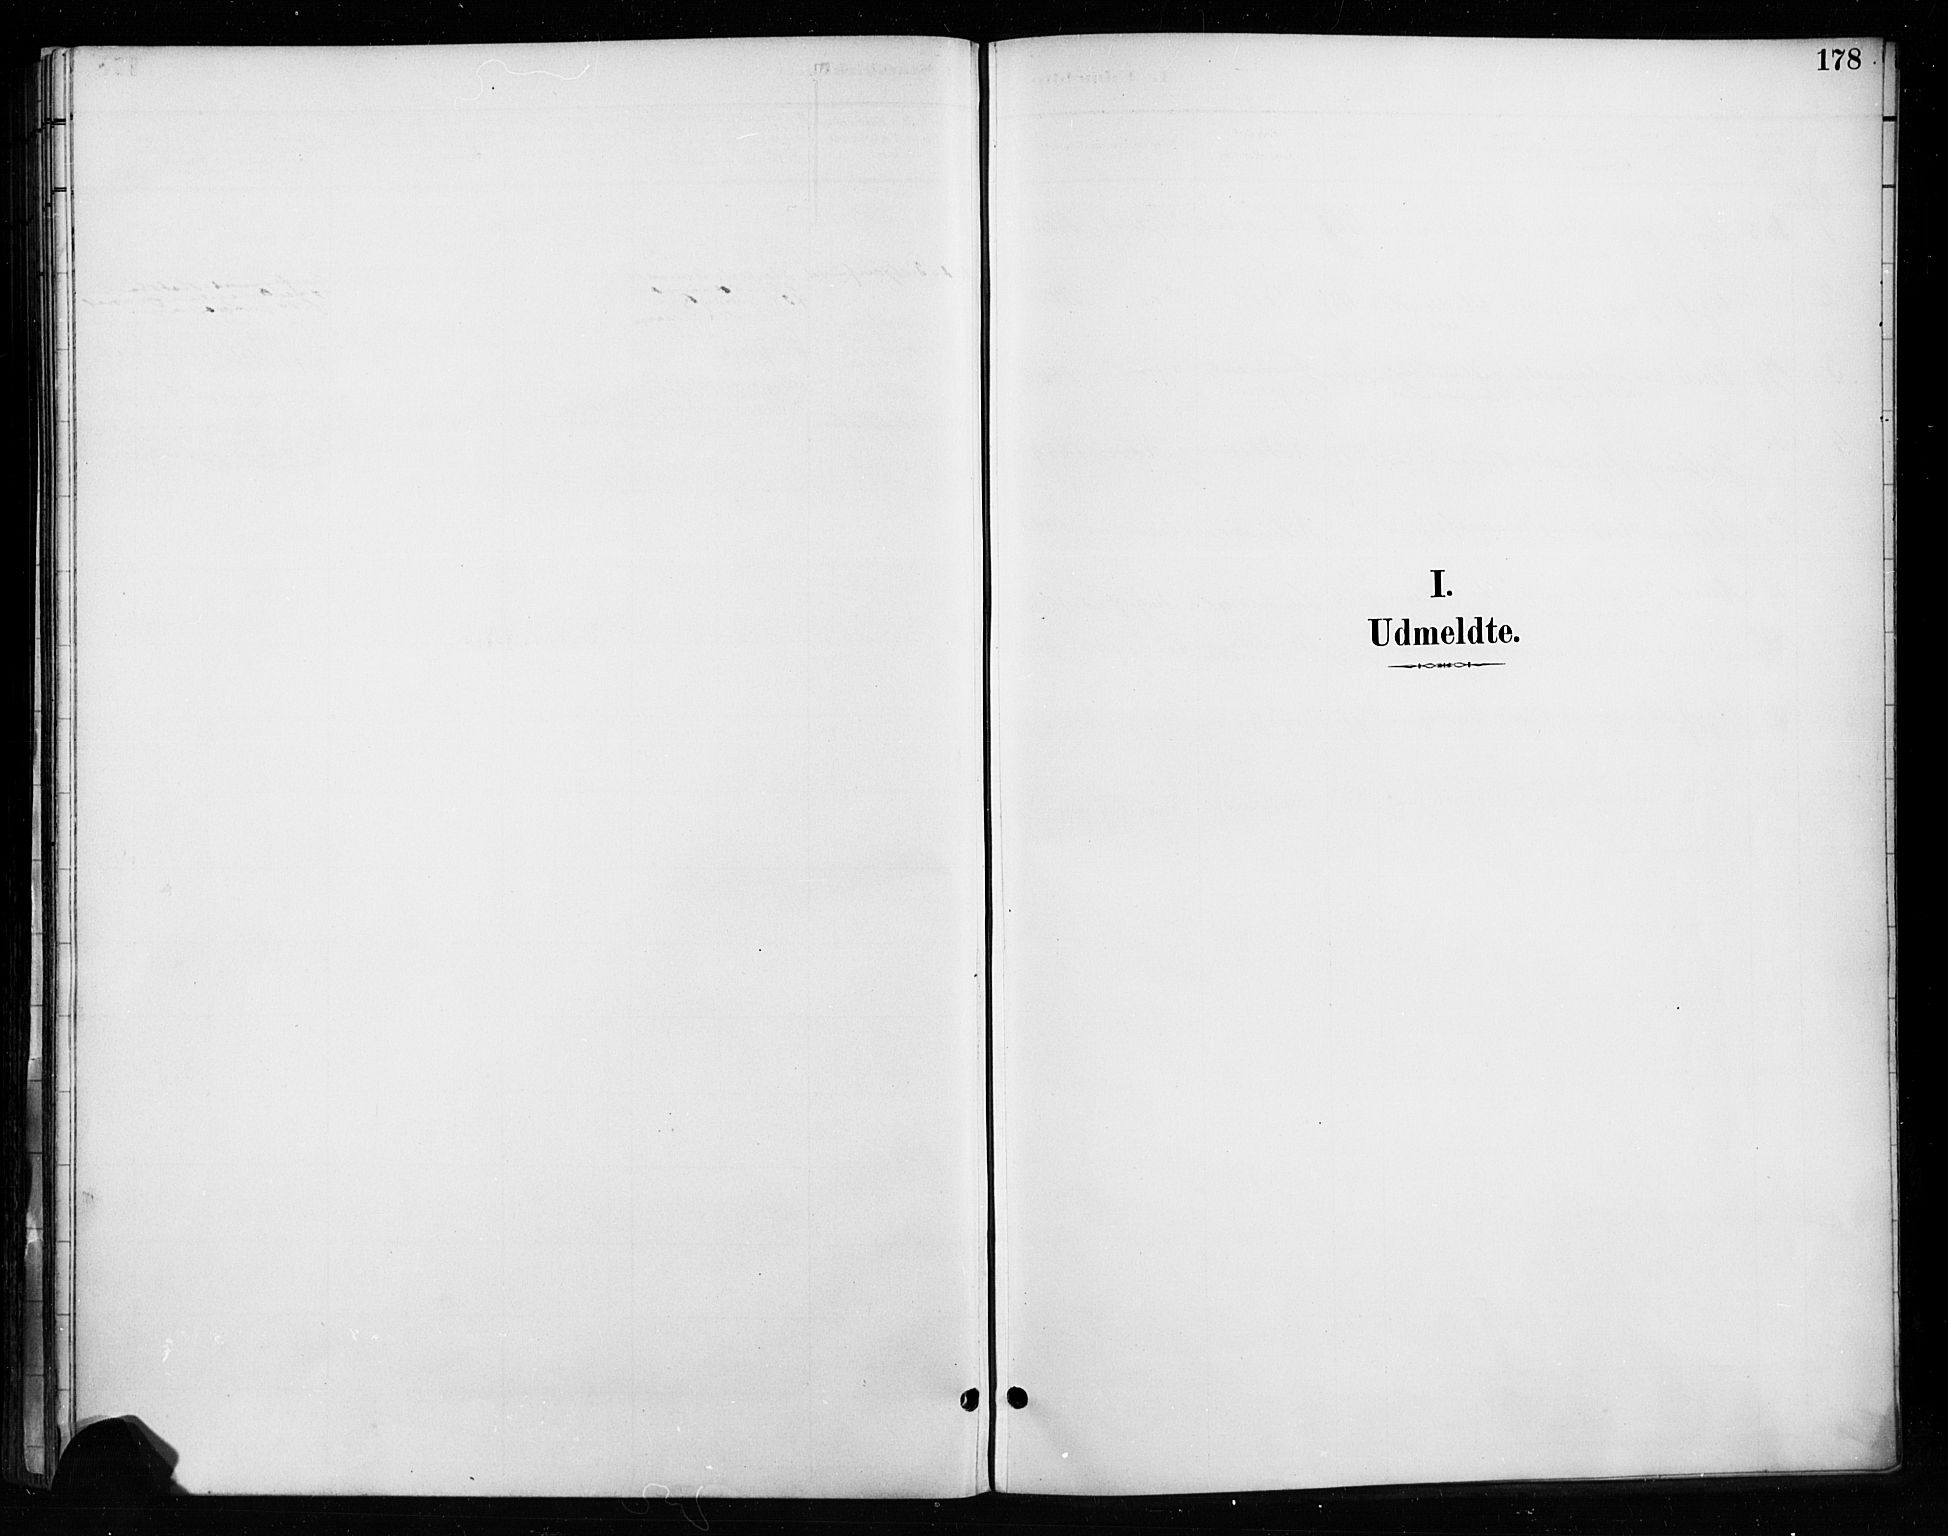 SAH, Gran prestekontor, Ministerialbok nr. 18, 1889-1899, s. 178